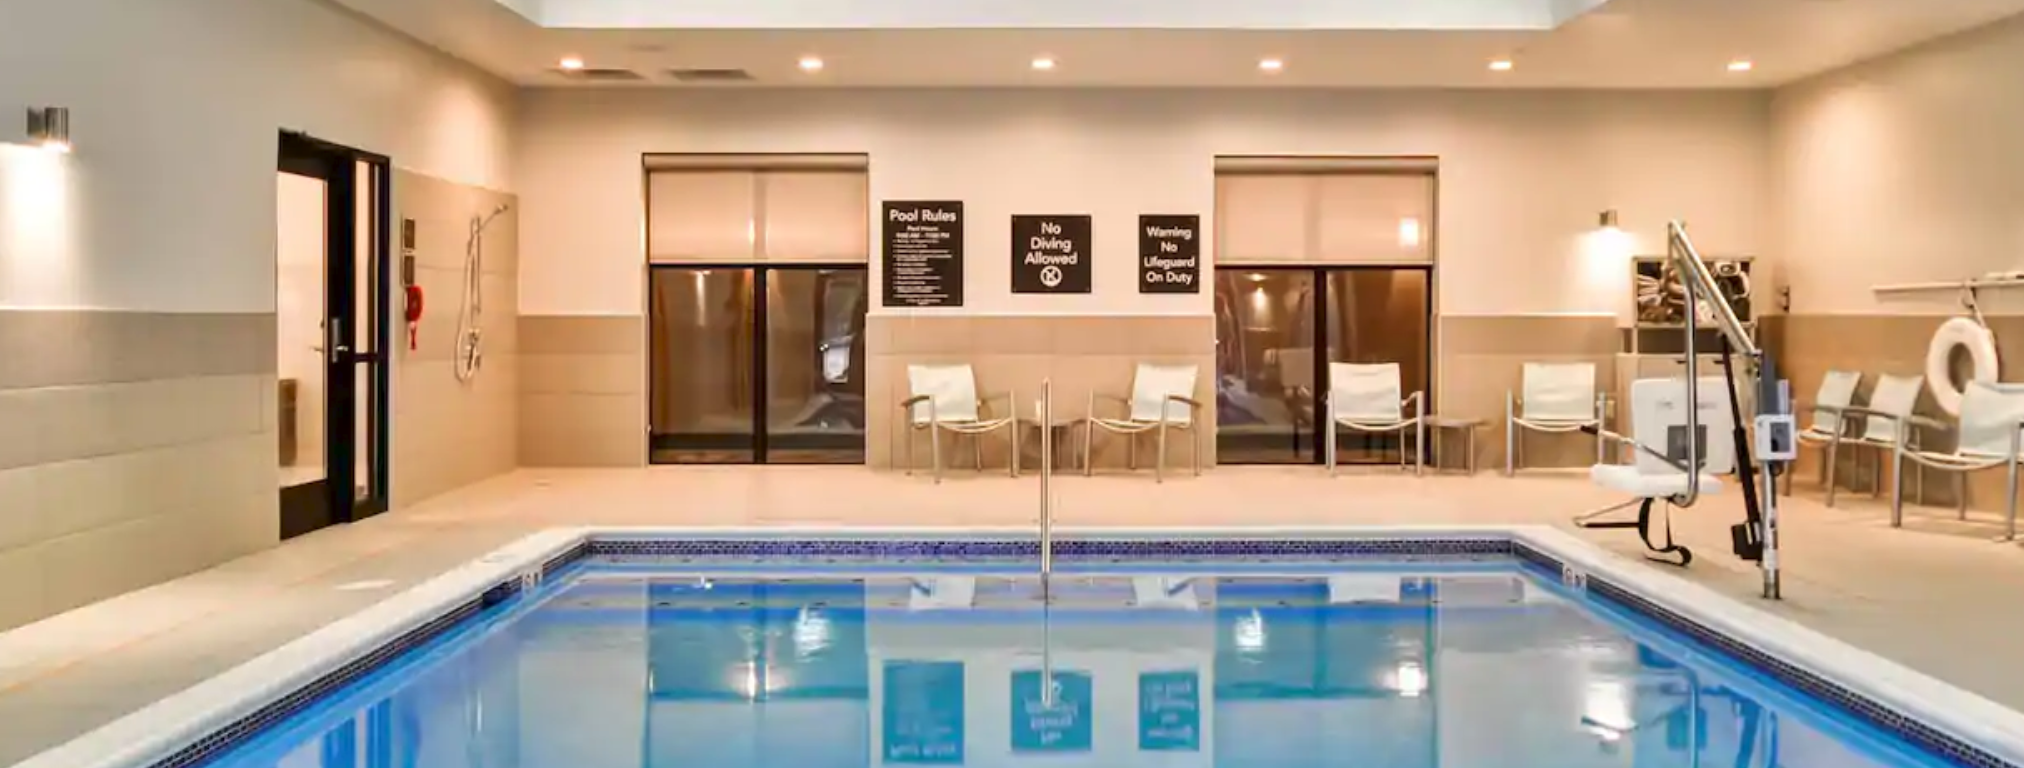 https://www.hotelsbyday.com/_data/default-hotel_image/3/19975/screenshot-2020-08-01-at-7-37-38-am.png